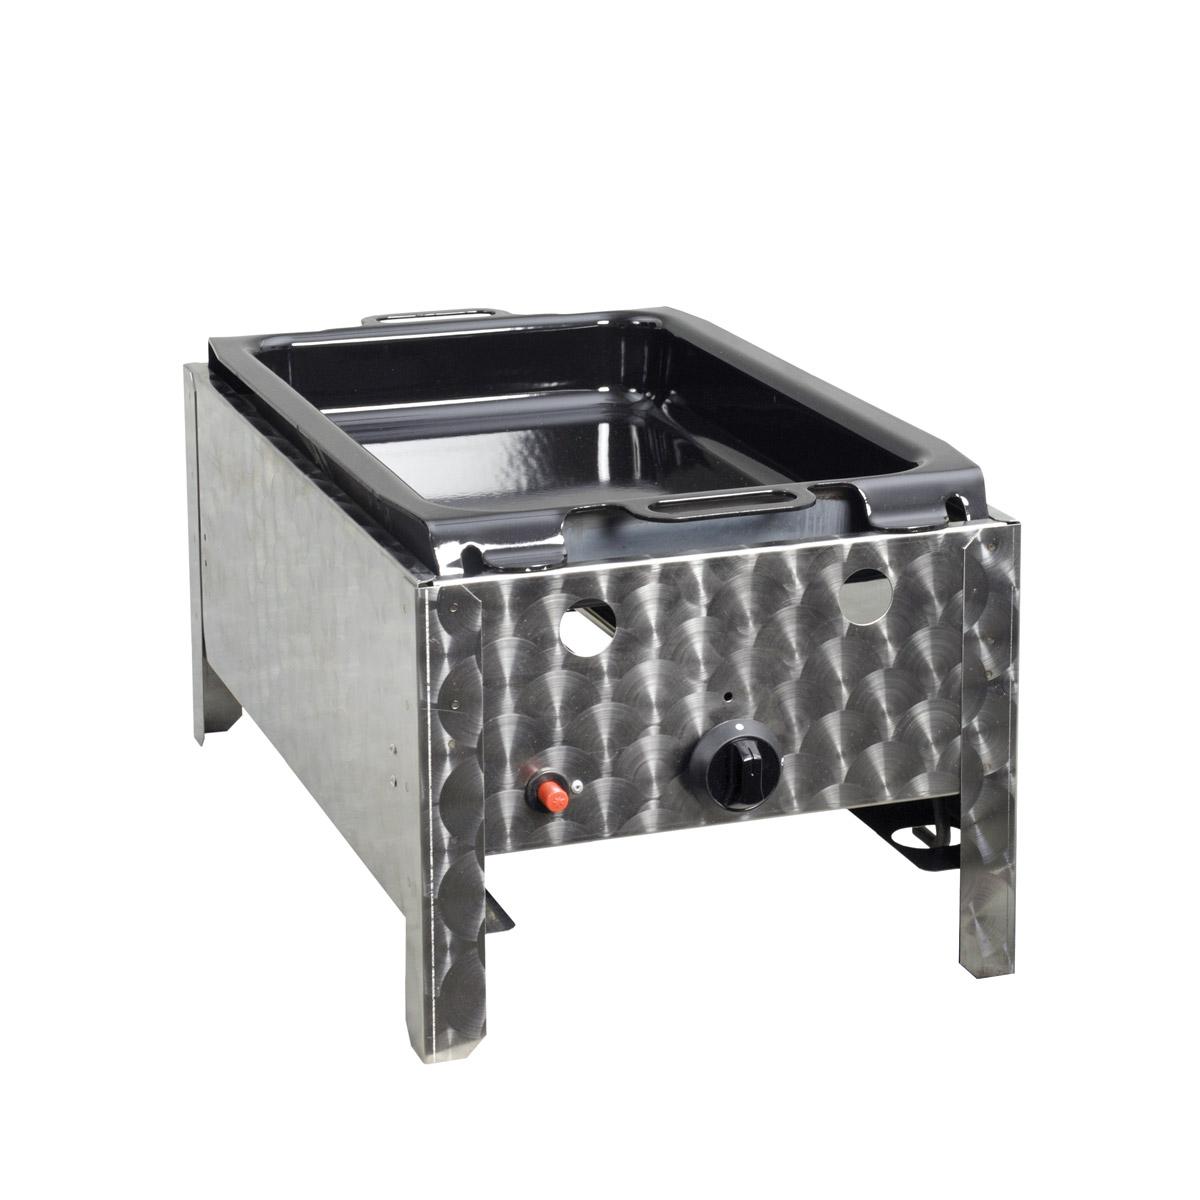 edelstahl gasgrill gasbr ter gas grill gastro neu p1em ebay. Black Bedroom Furniture Sets. Home Design Ideas